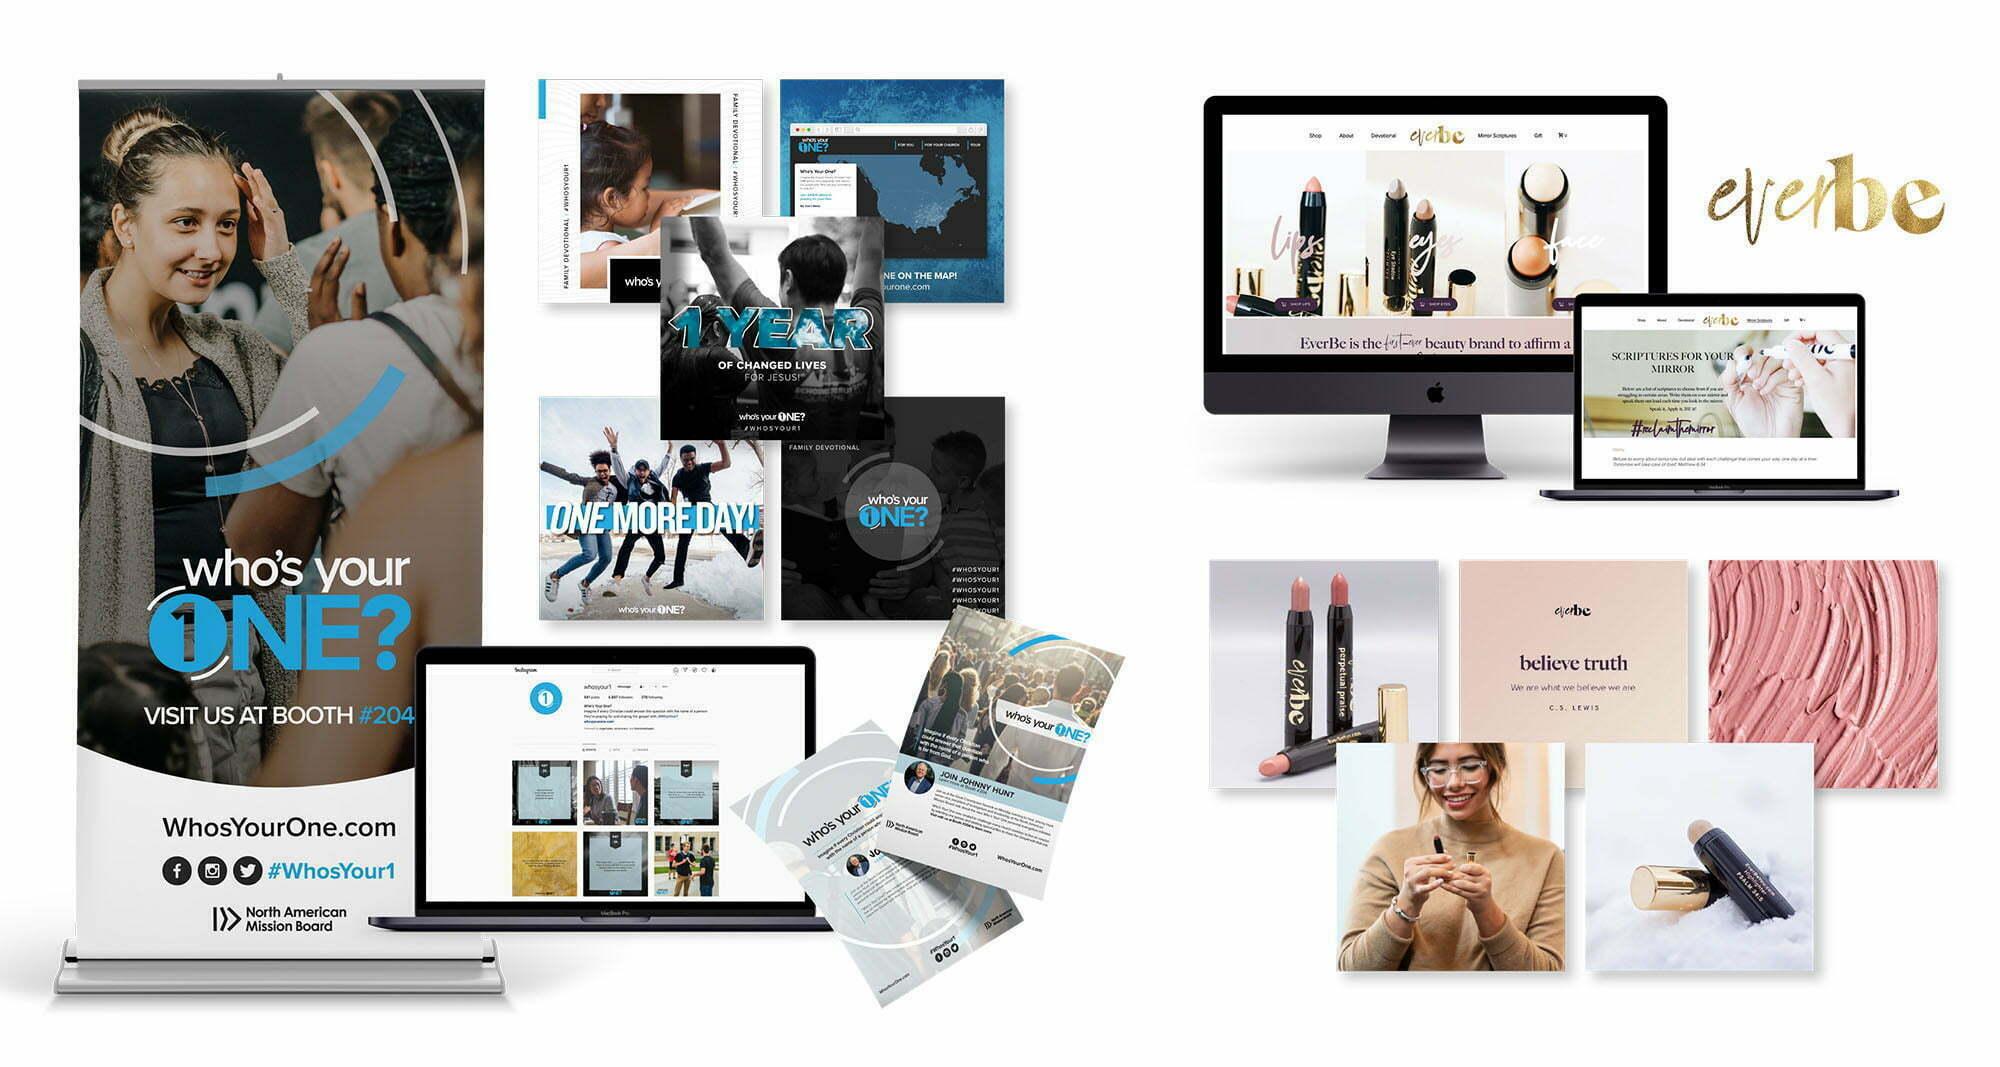 Epic Digital Marketing - Graphic design